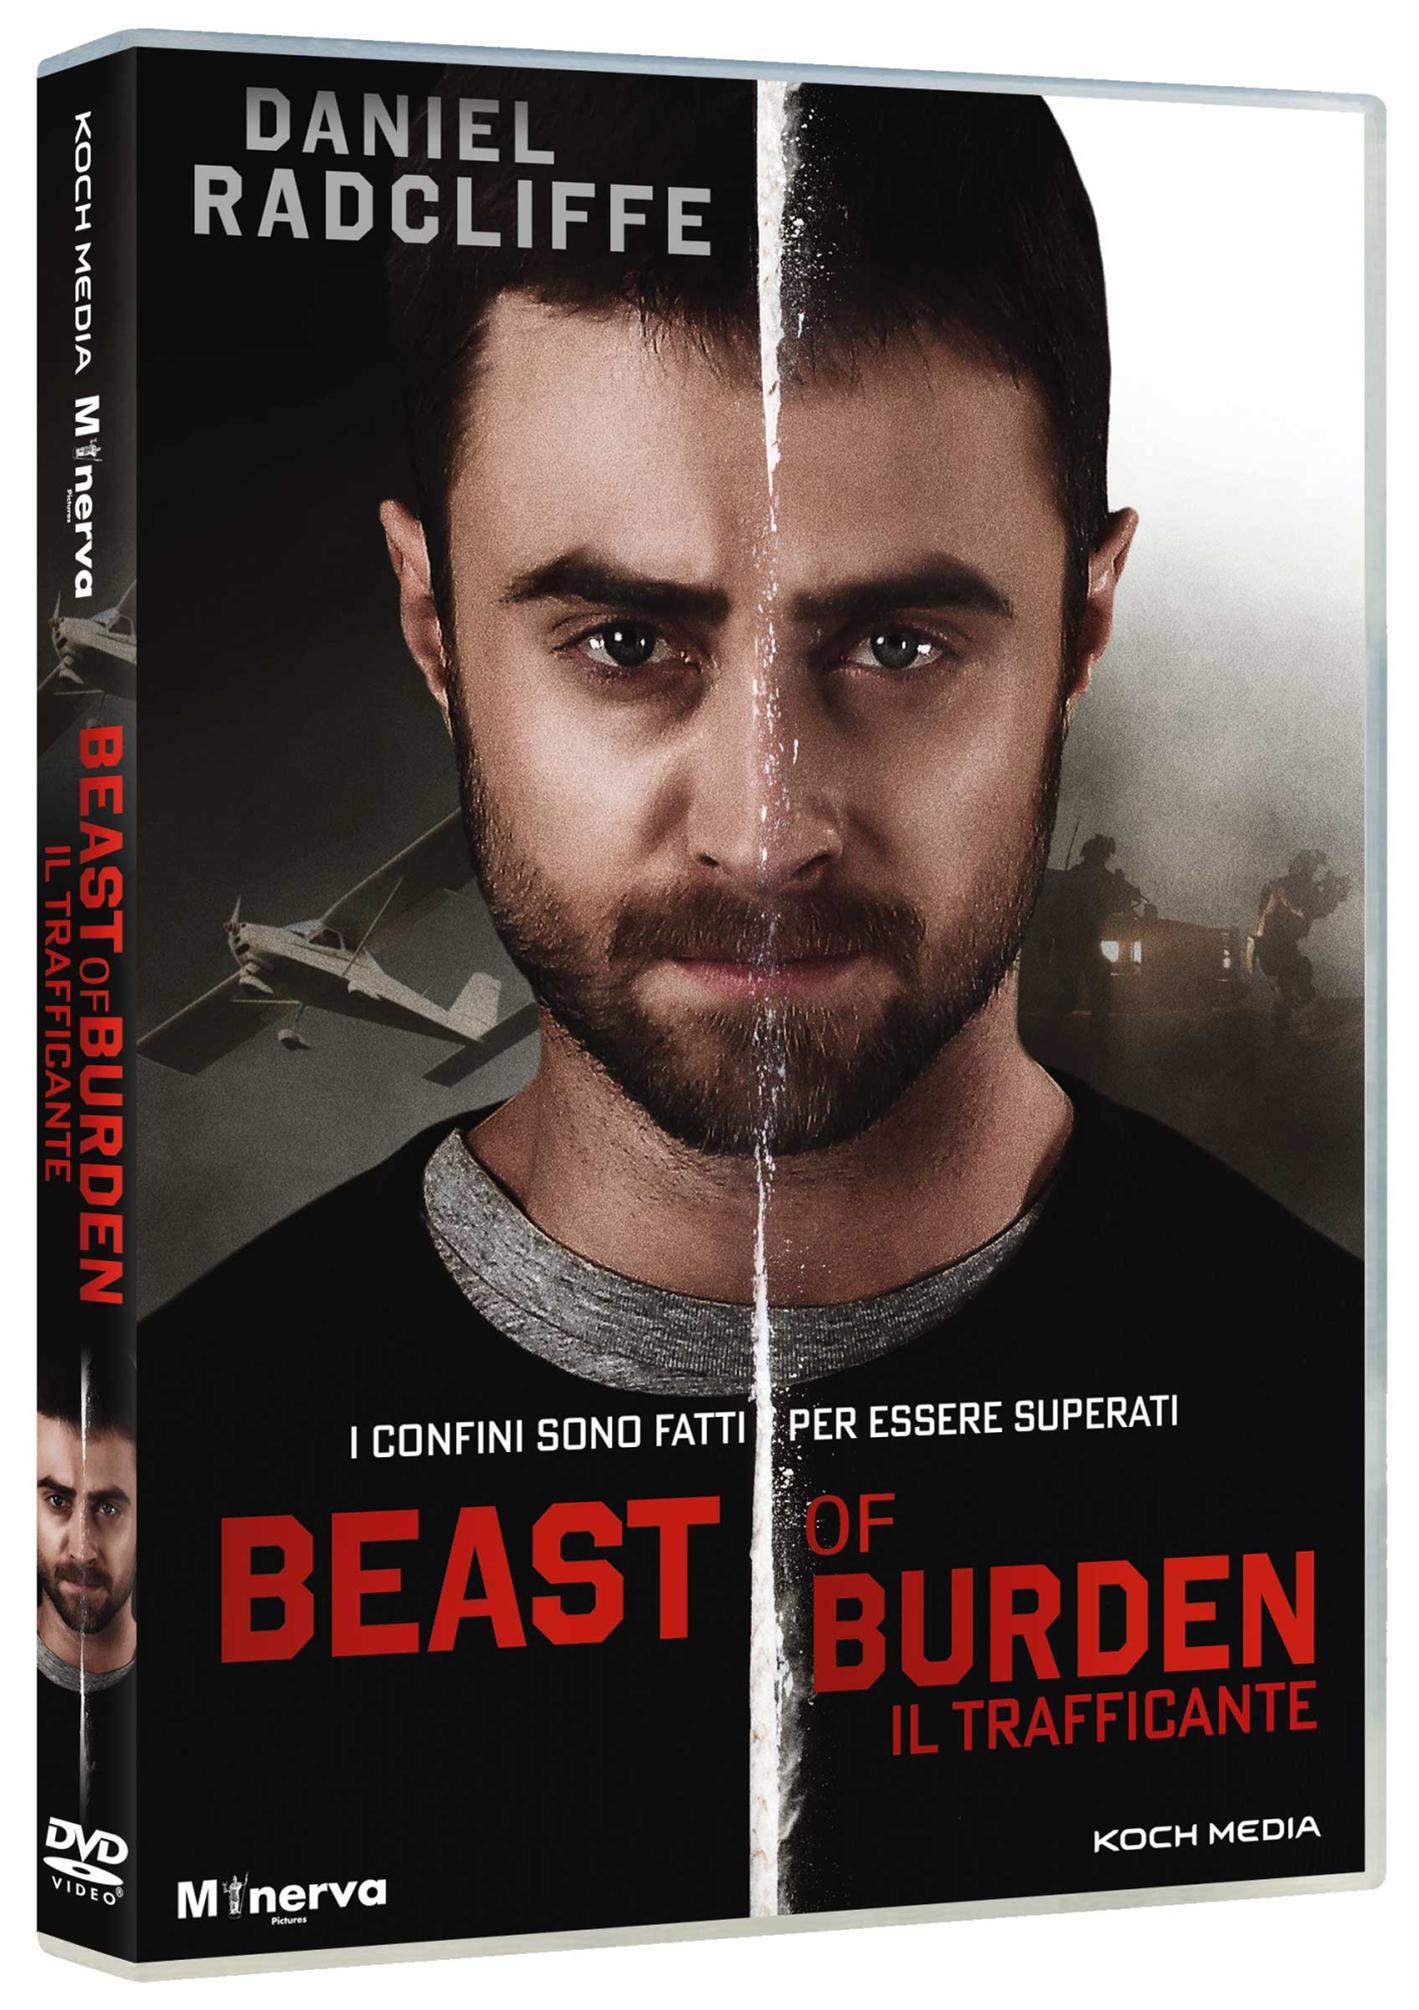 BEAST OF BURDEN - IL TRAFFICANTE (DVD)